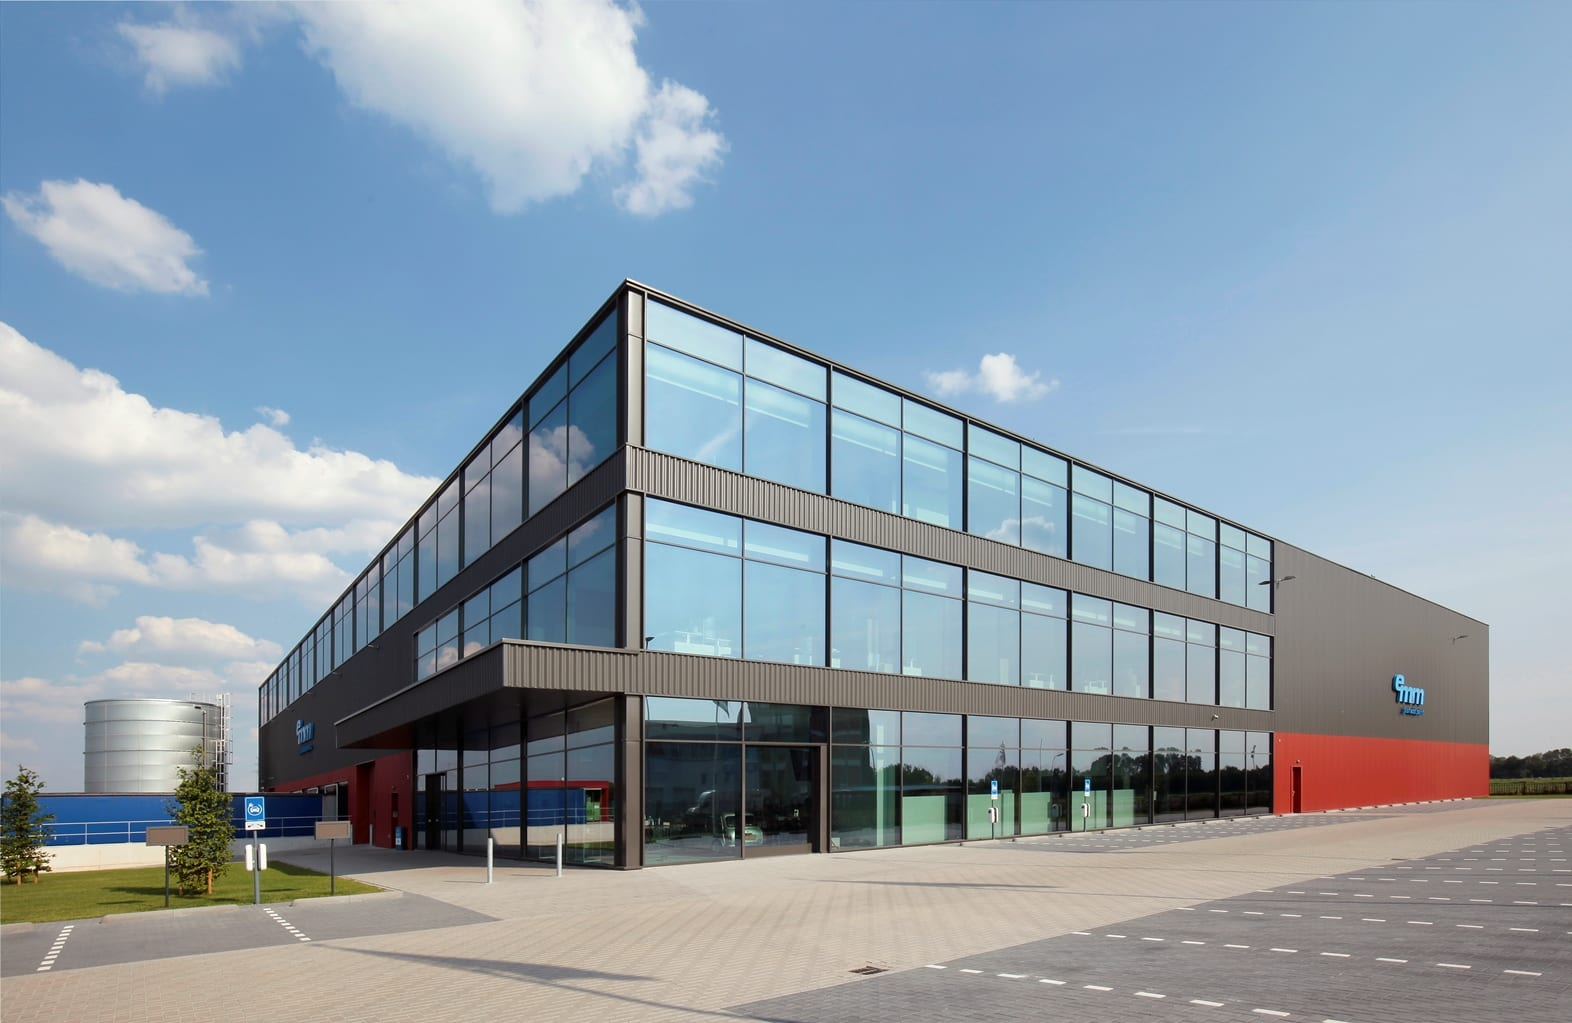 Nieuw bedrijfspand EMM International Zwolle